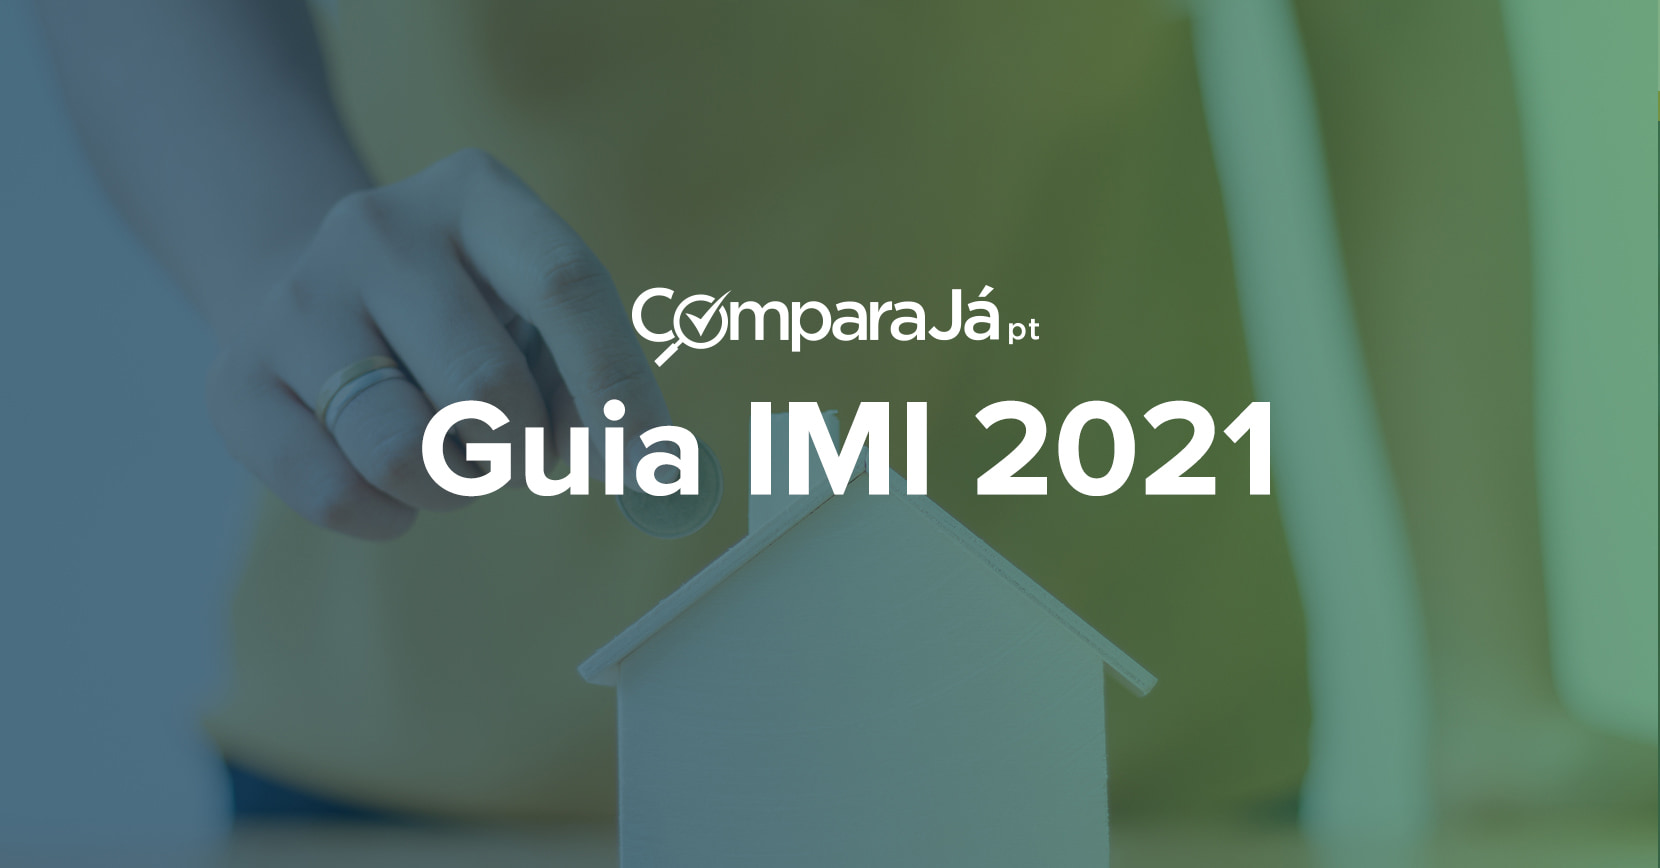 Guia IMI 2021